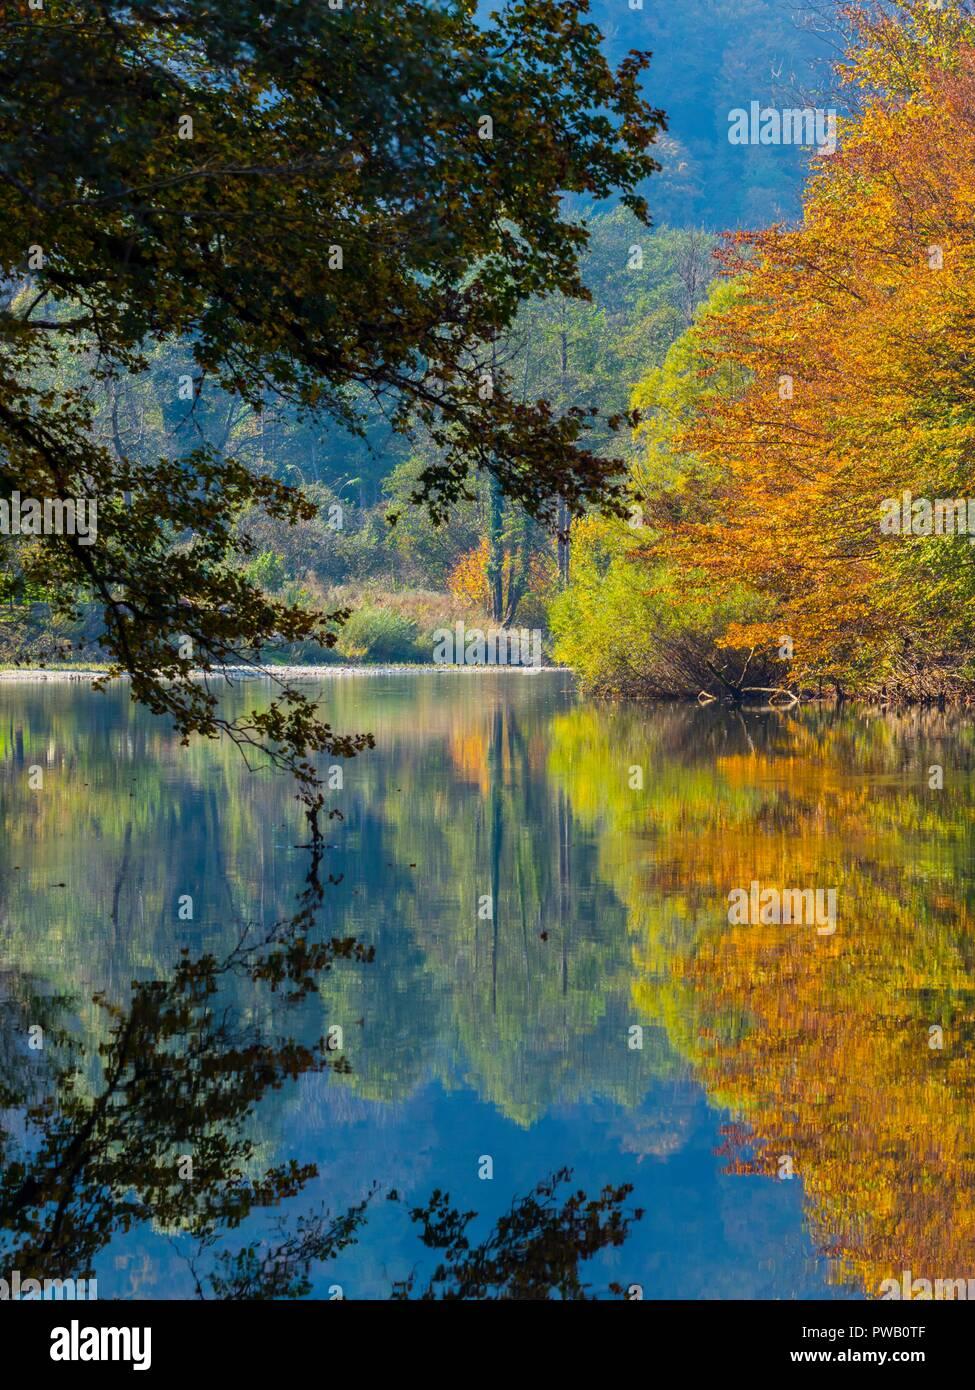 Autumn scenery in nature Brod na Kupi in Croatia - Stock Image